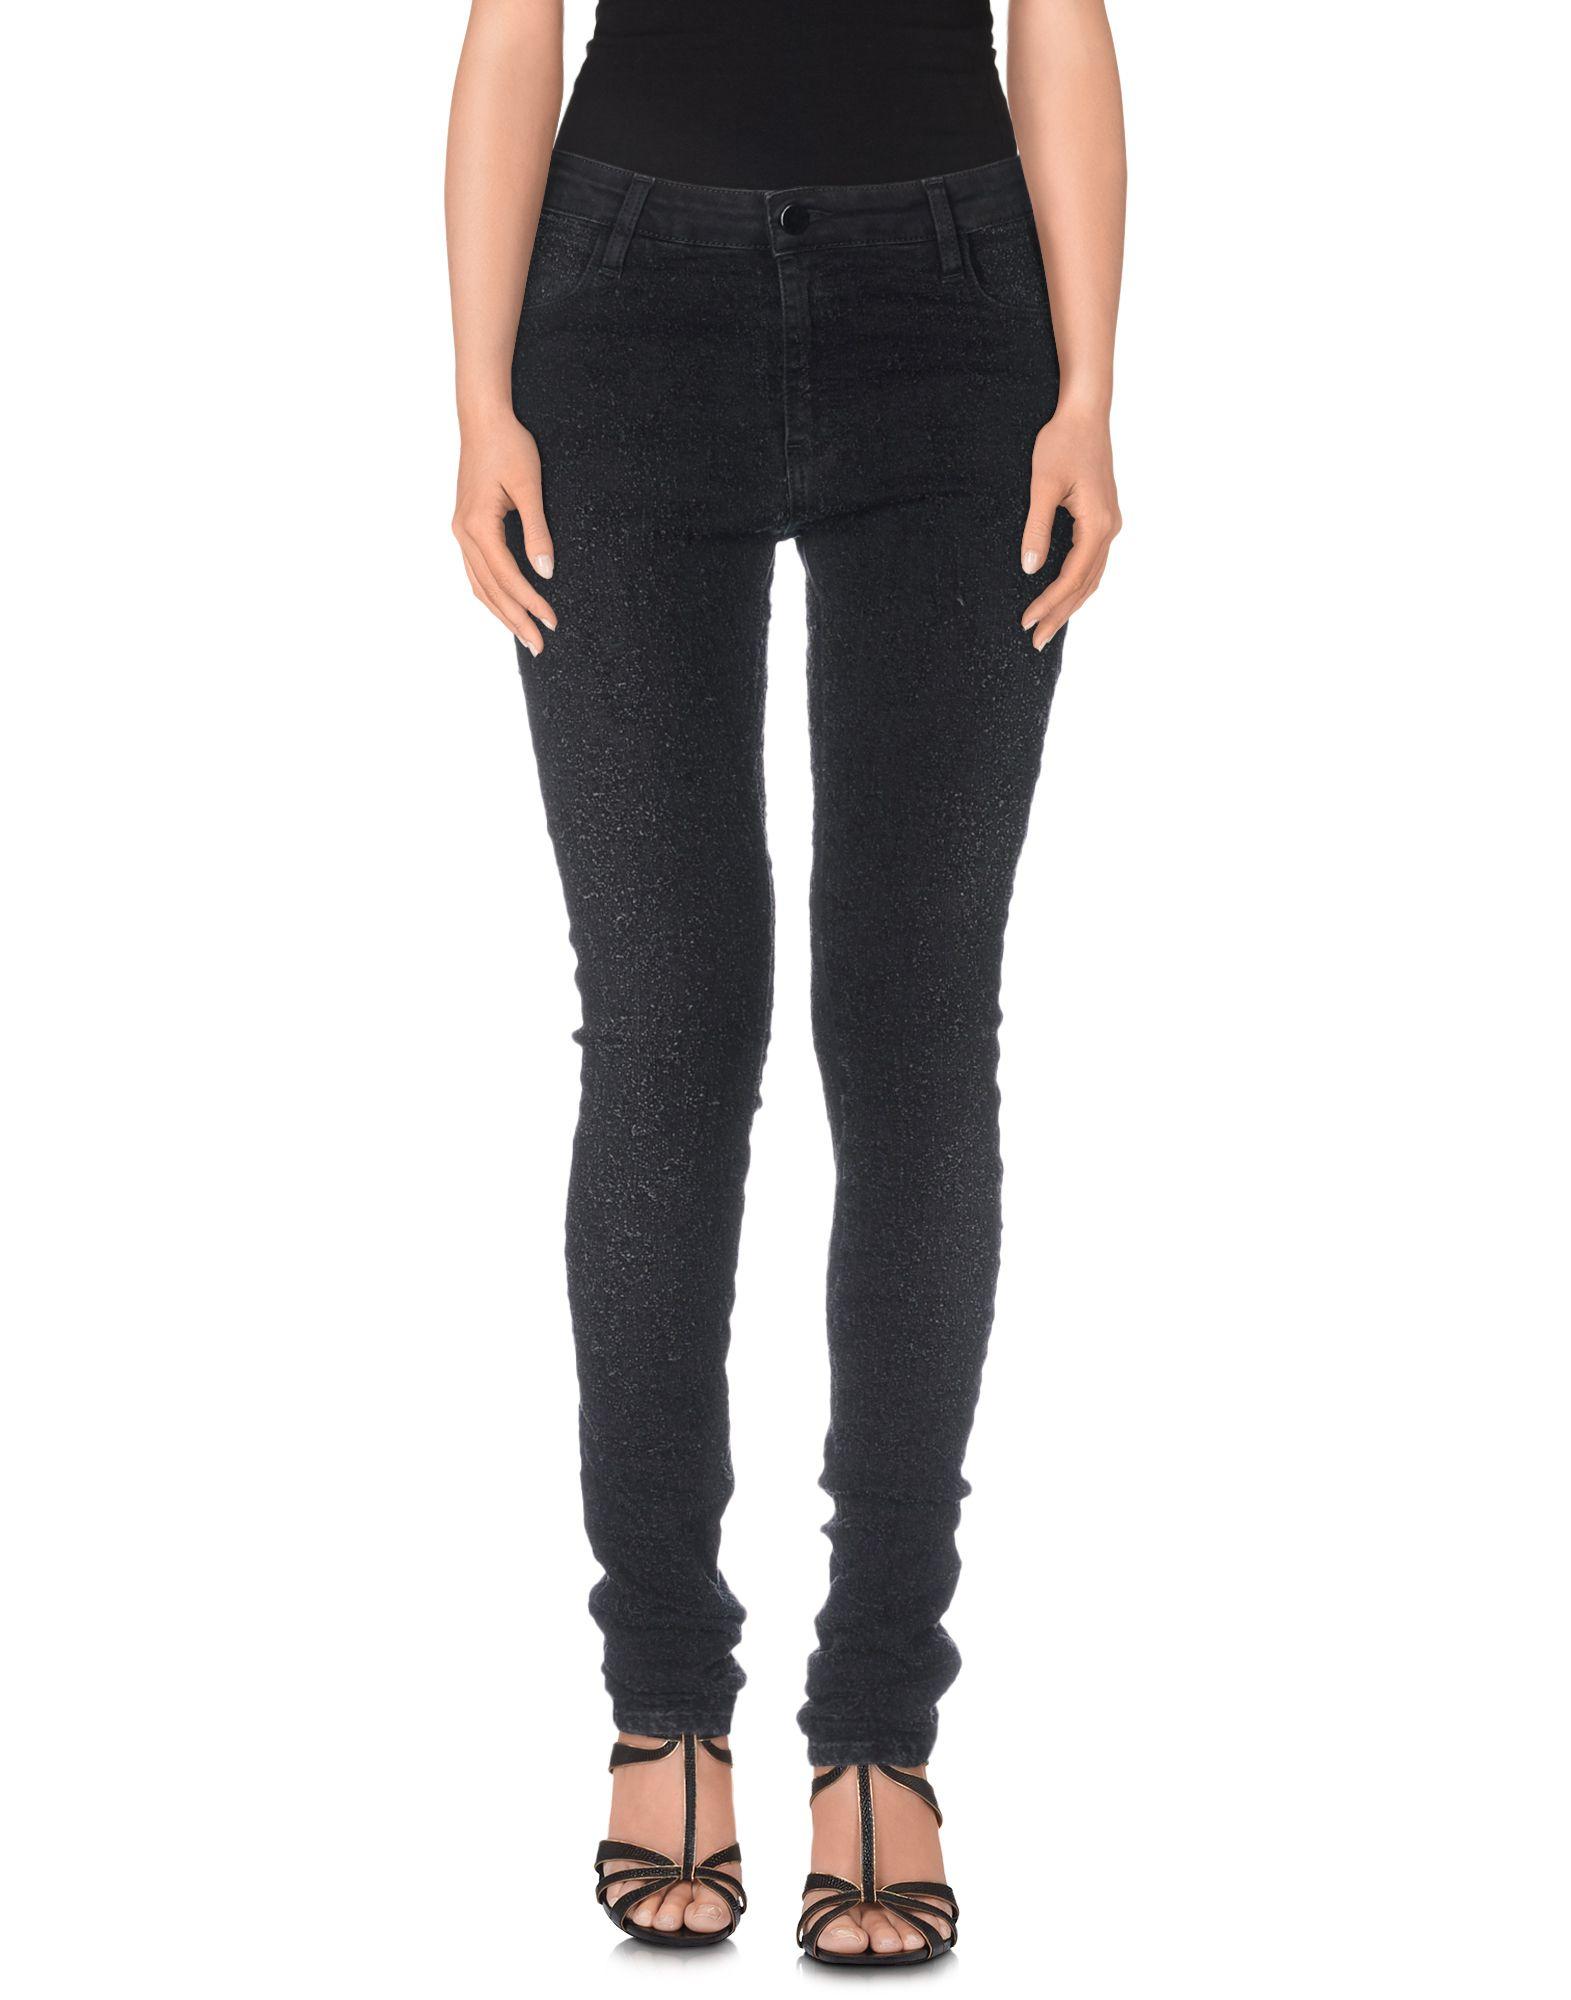 Pantaloni Jeans Brockenbow Donna - Acquista online su xMIAn